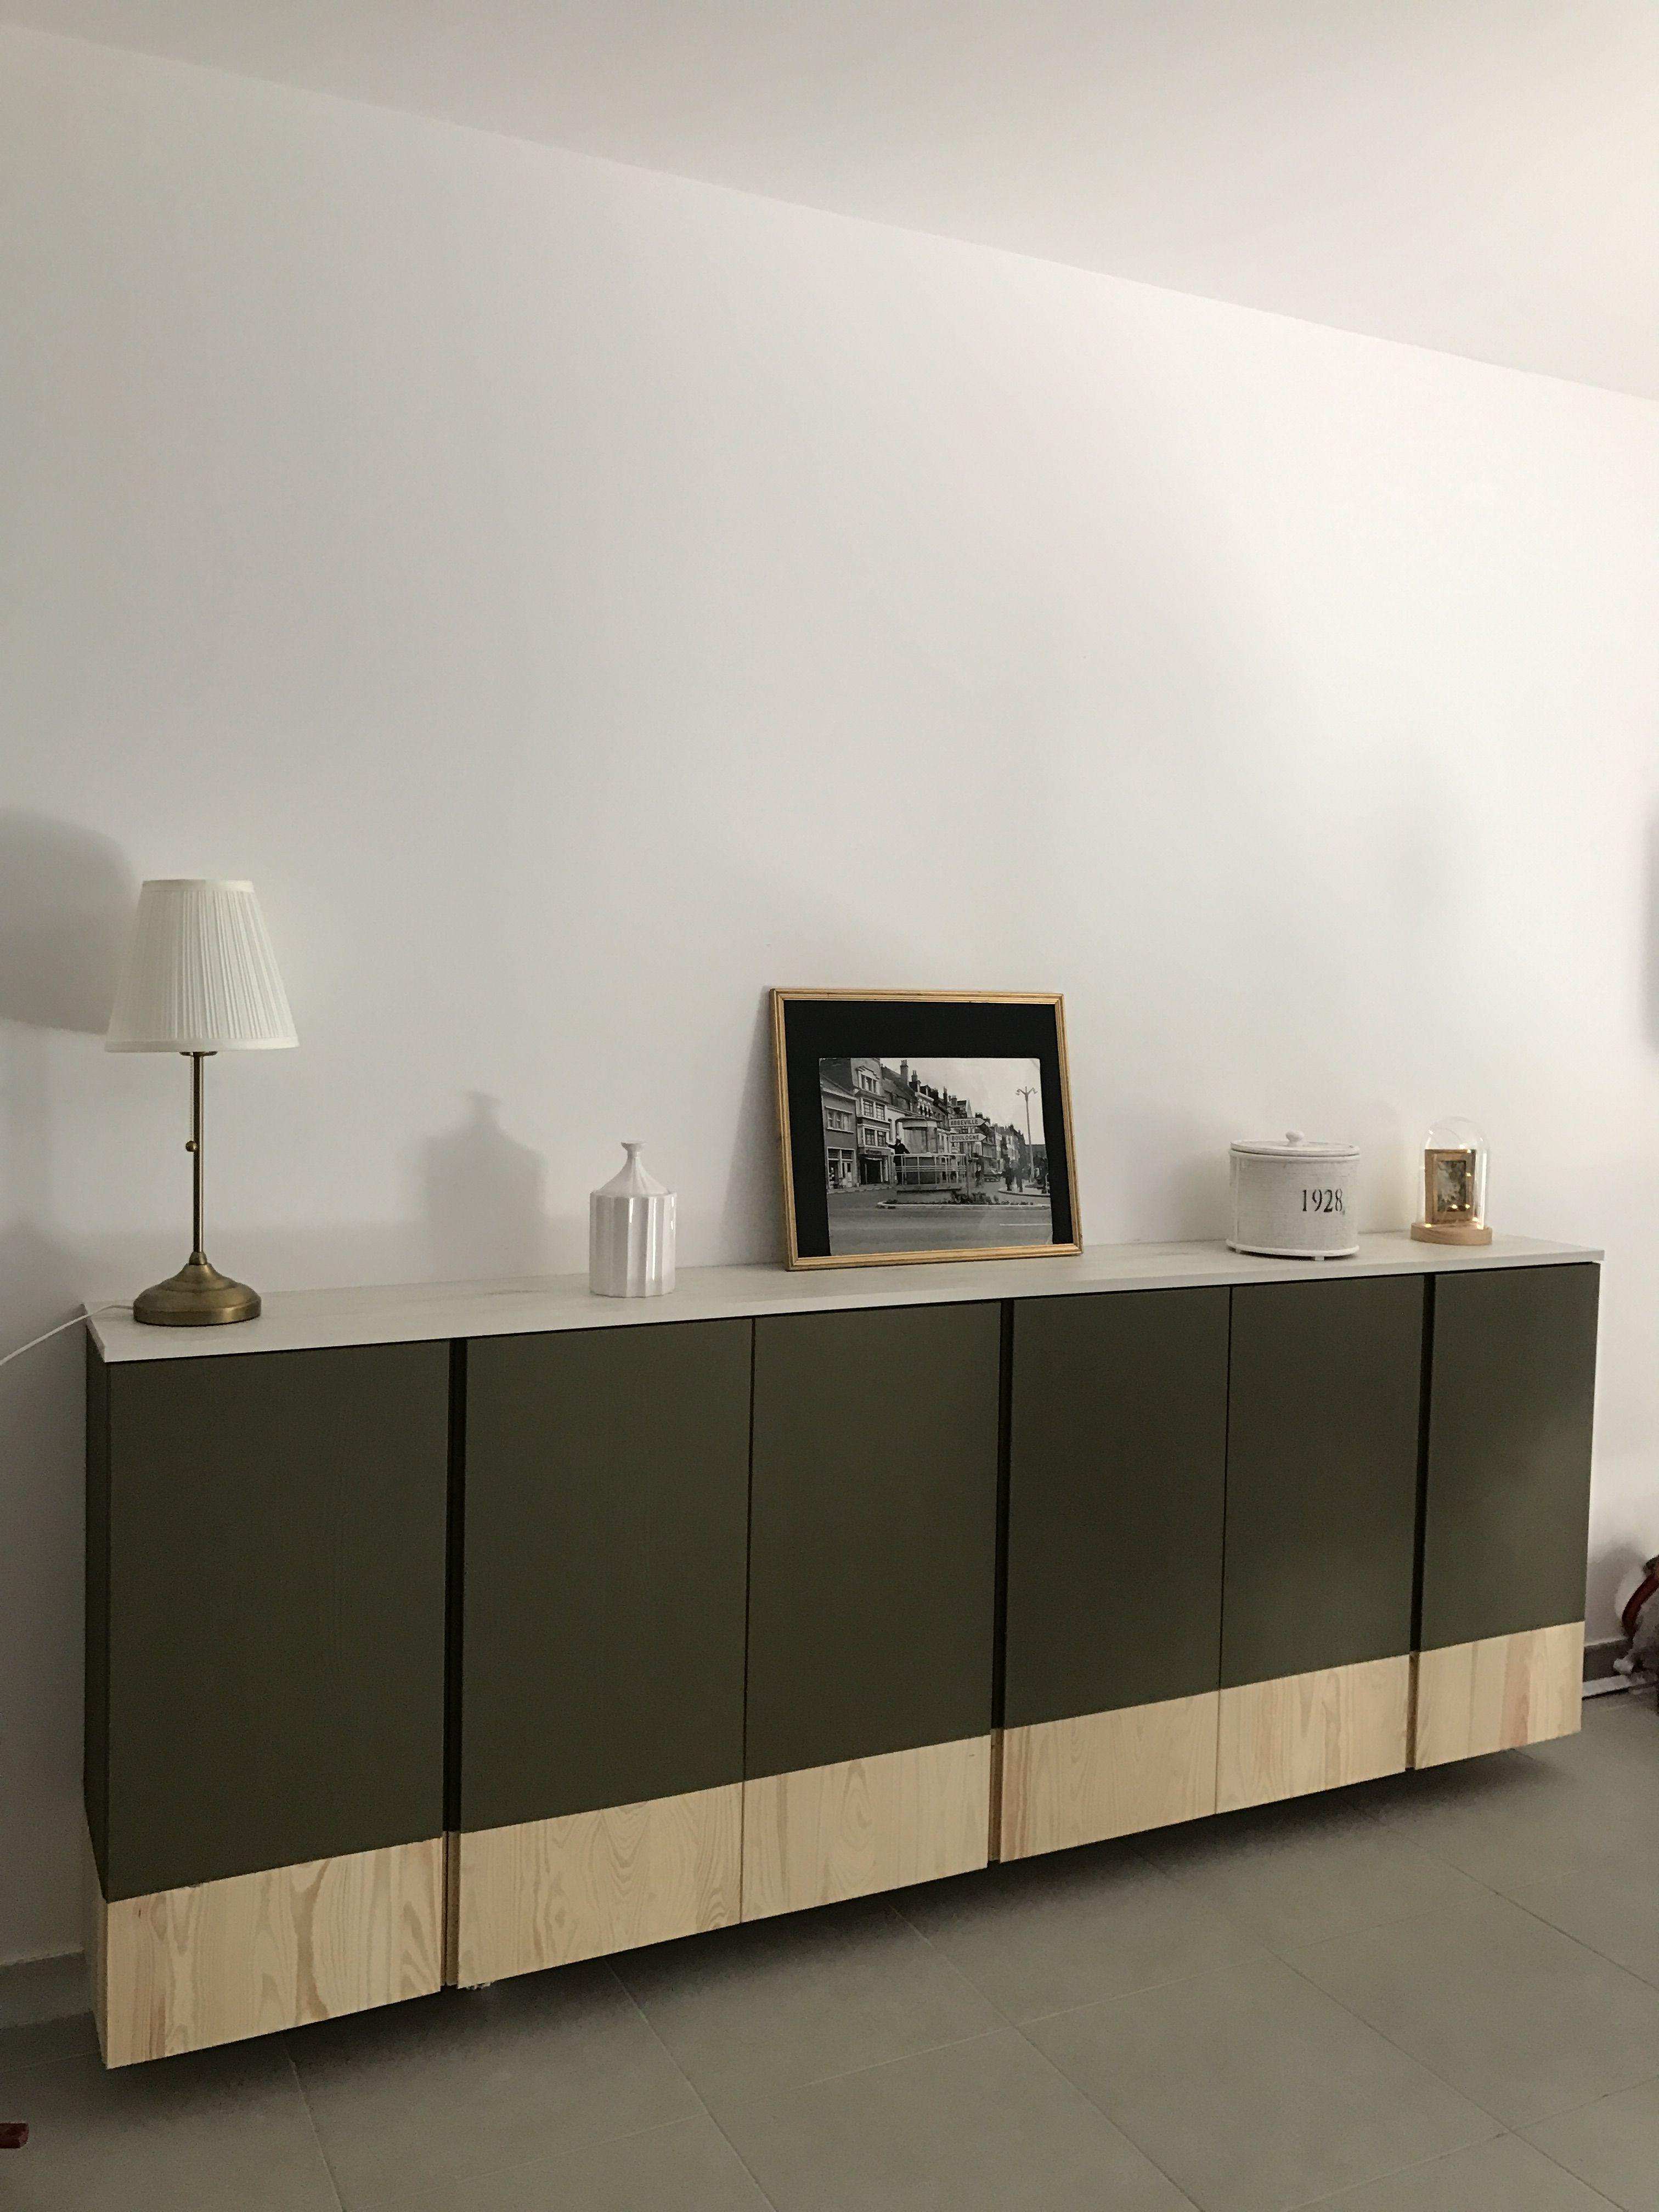 meuble ikea ivar peint bi ton peinture leroy merlin vert botanique n 1 esprit chic cosy. Black Bedroom Furniture Sets. Home Design Ideas